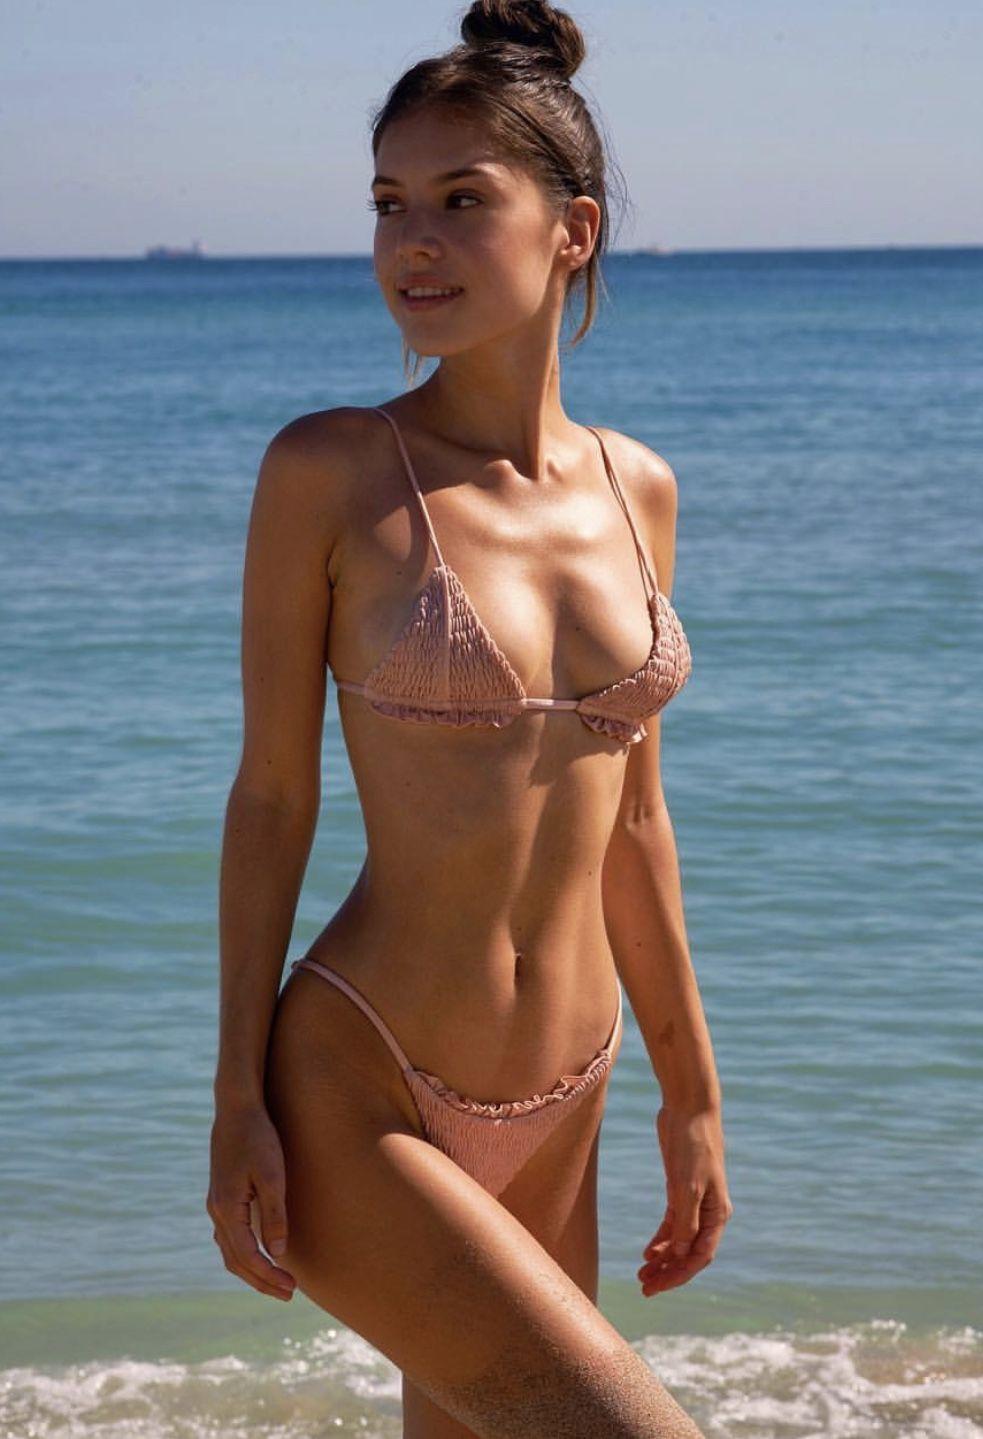 Bikini Girls Pinterest